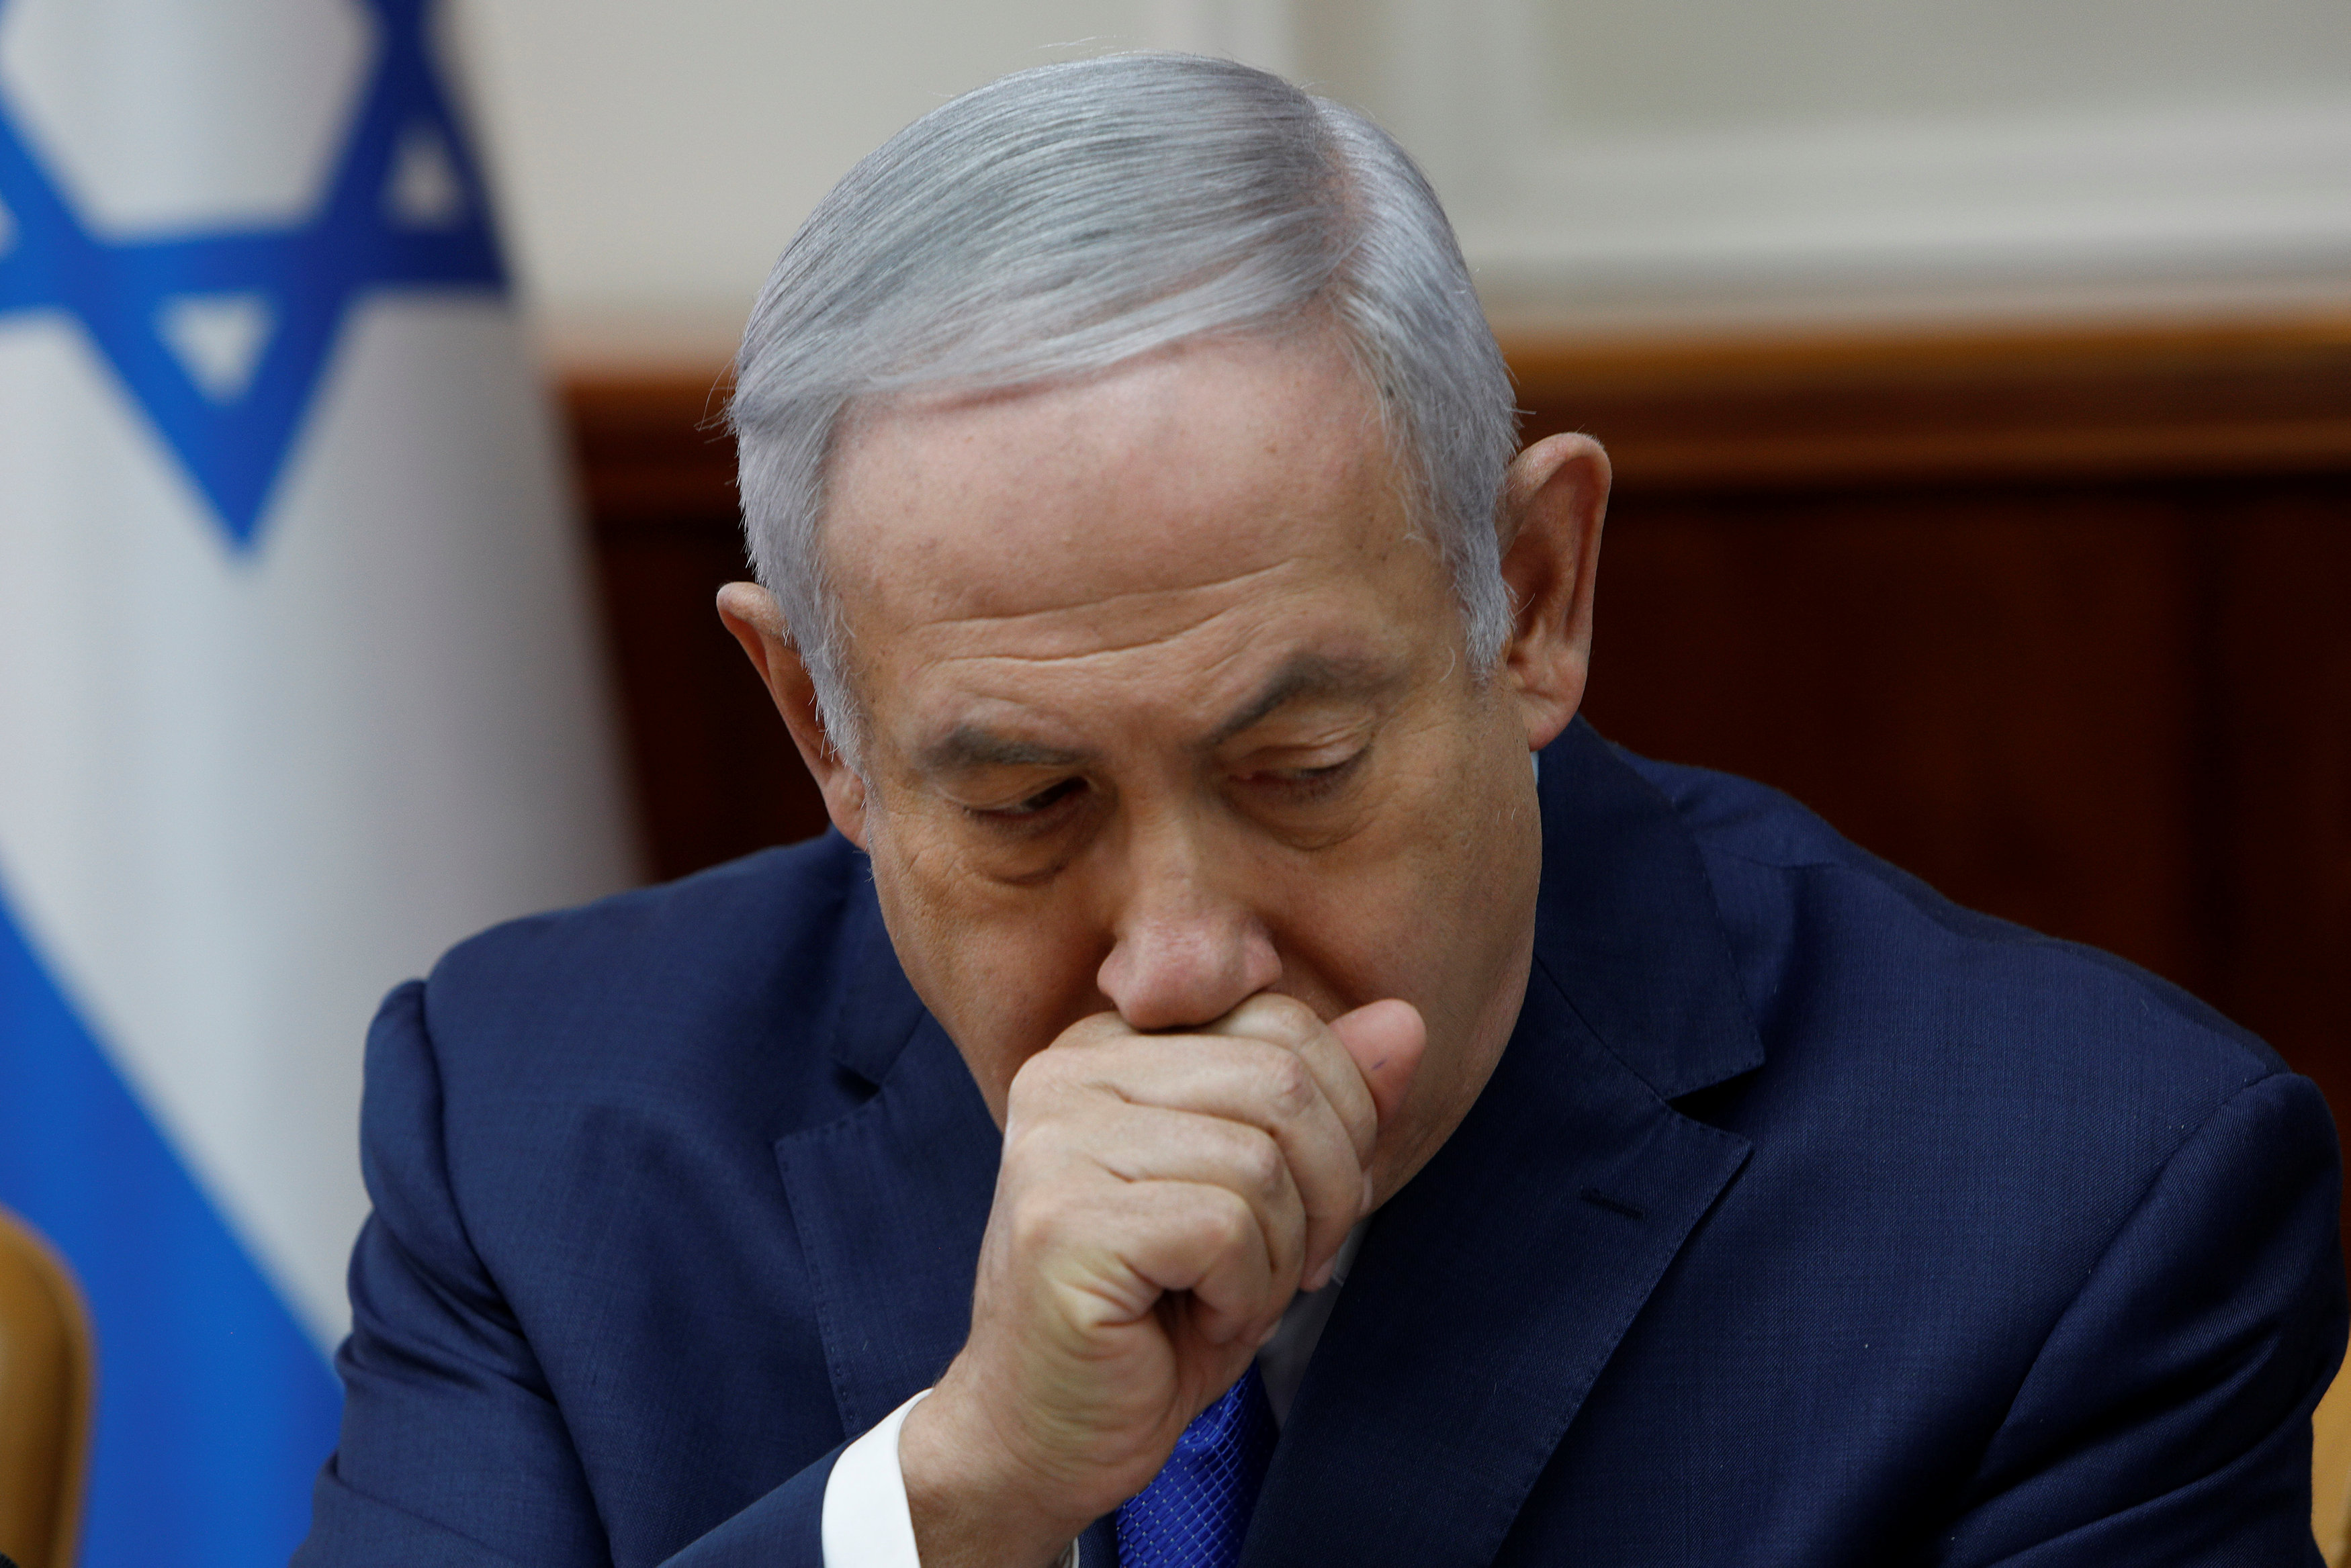 2018 12 02T110602Z 115920869 RC1536B536B0 RTRMADP 3 ISRAEL NETANYAHU CORRUPTION